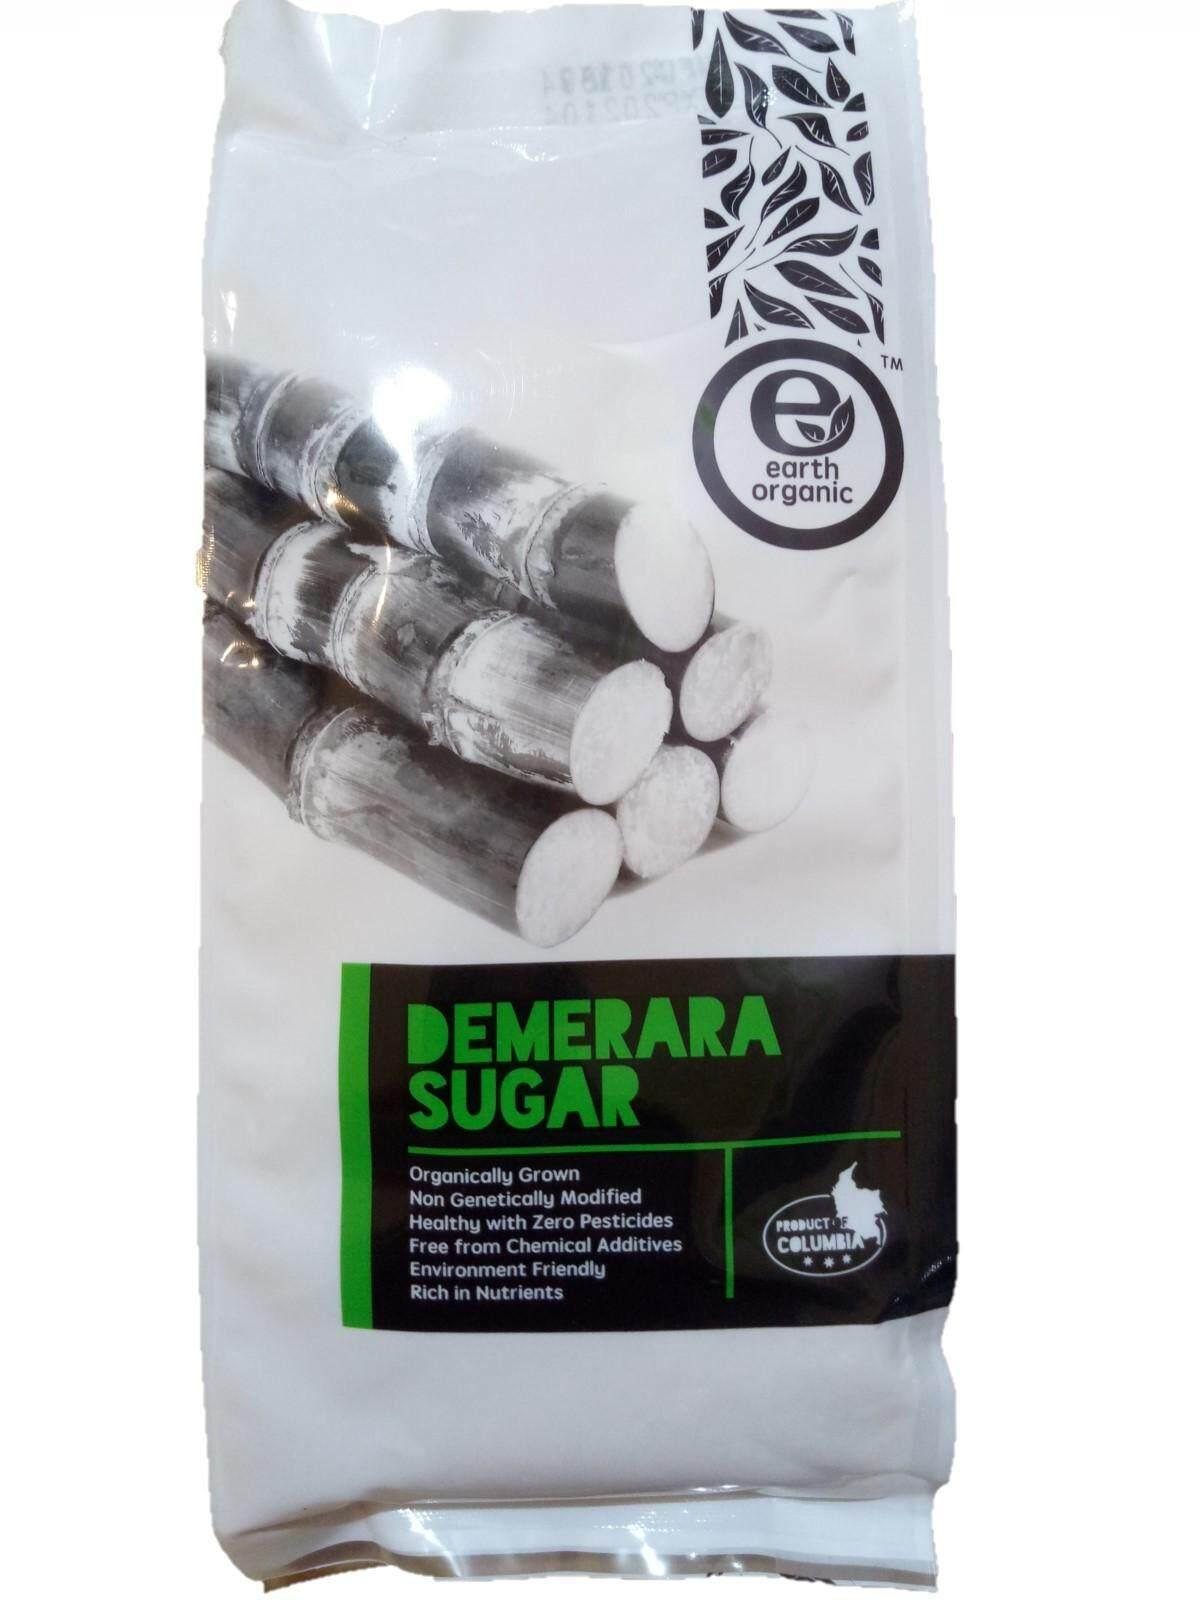 Earth Organic Demarara Sugar 1kg Product of Columbia (certified USDA Organic )